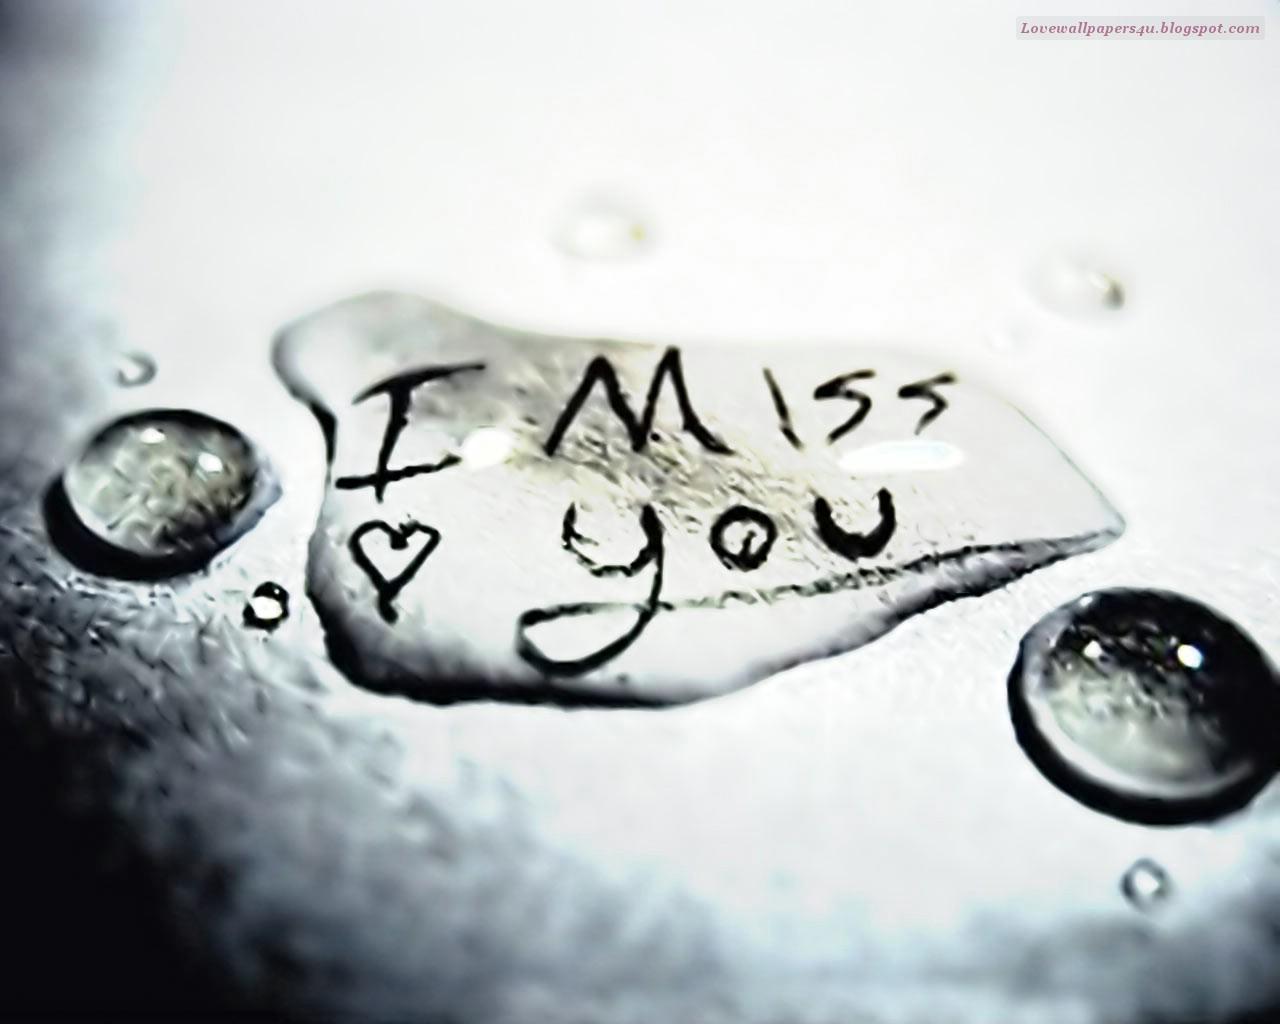 http://3.bp.blogspot.com/_Ro_mzwr3aEM/TQ2hTc85TCI/AAAAAAAAACg/0VuSUqOcKCY/s1600/I_Miss_you.jpg